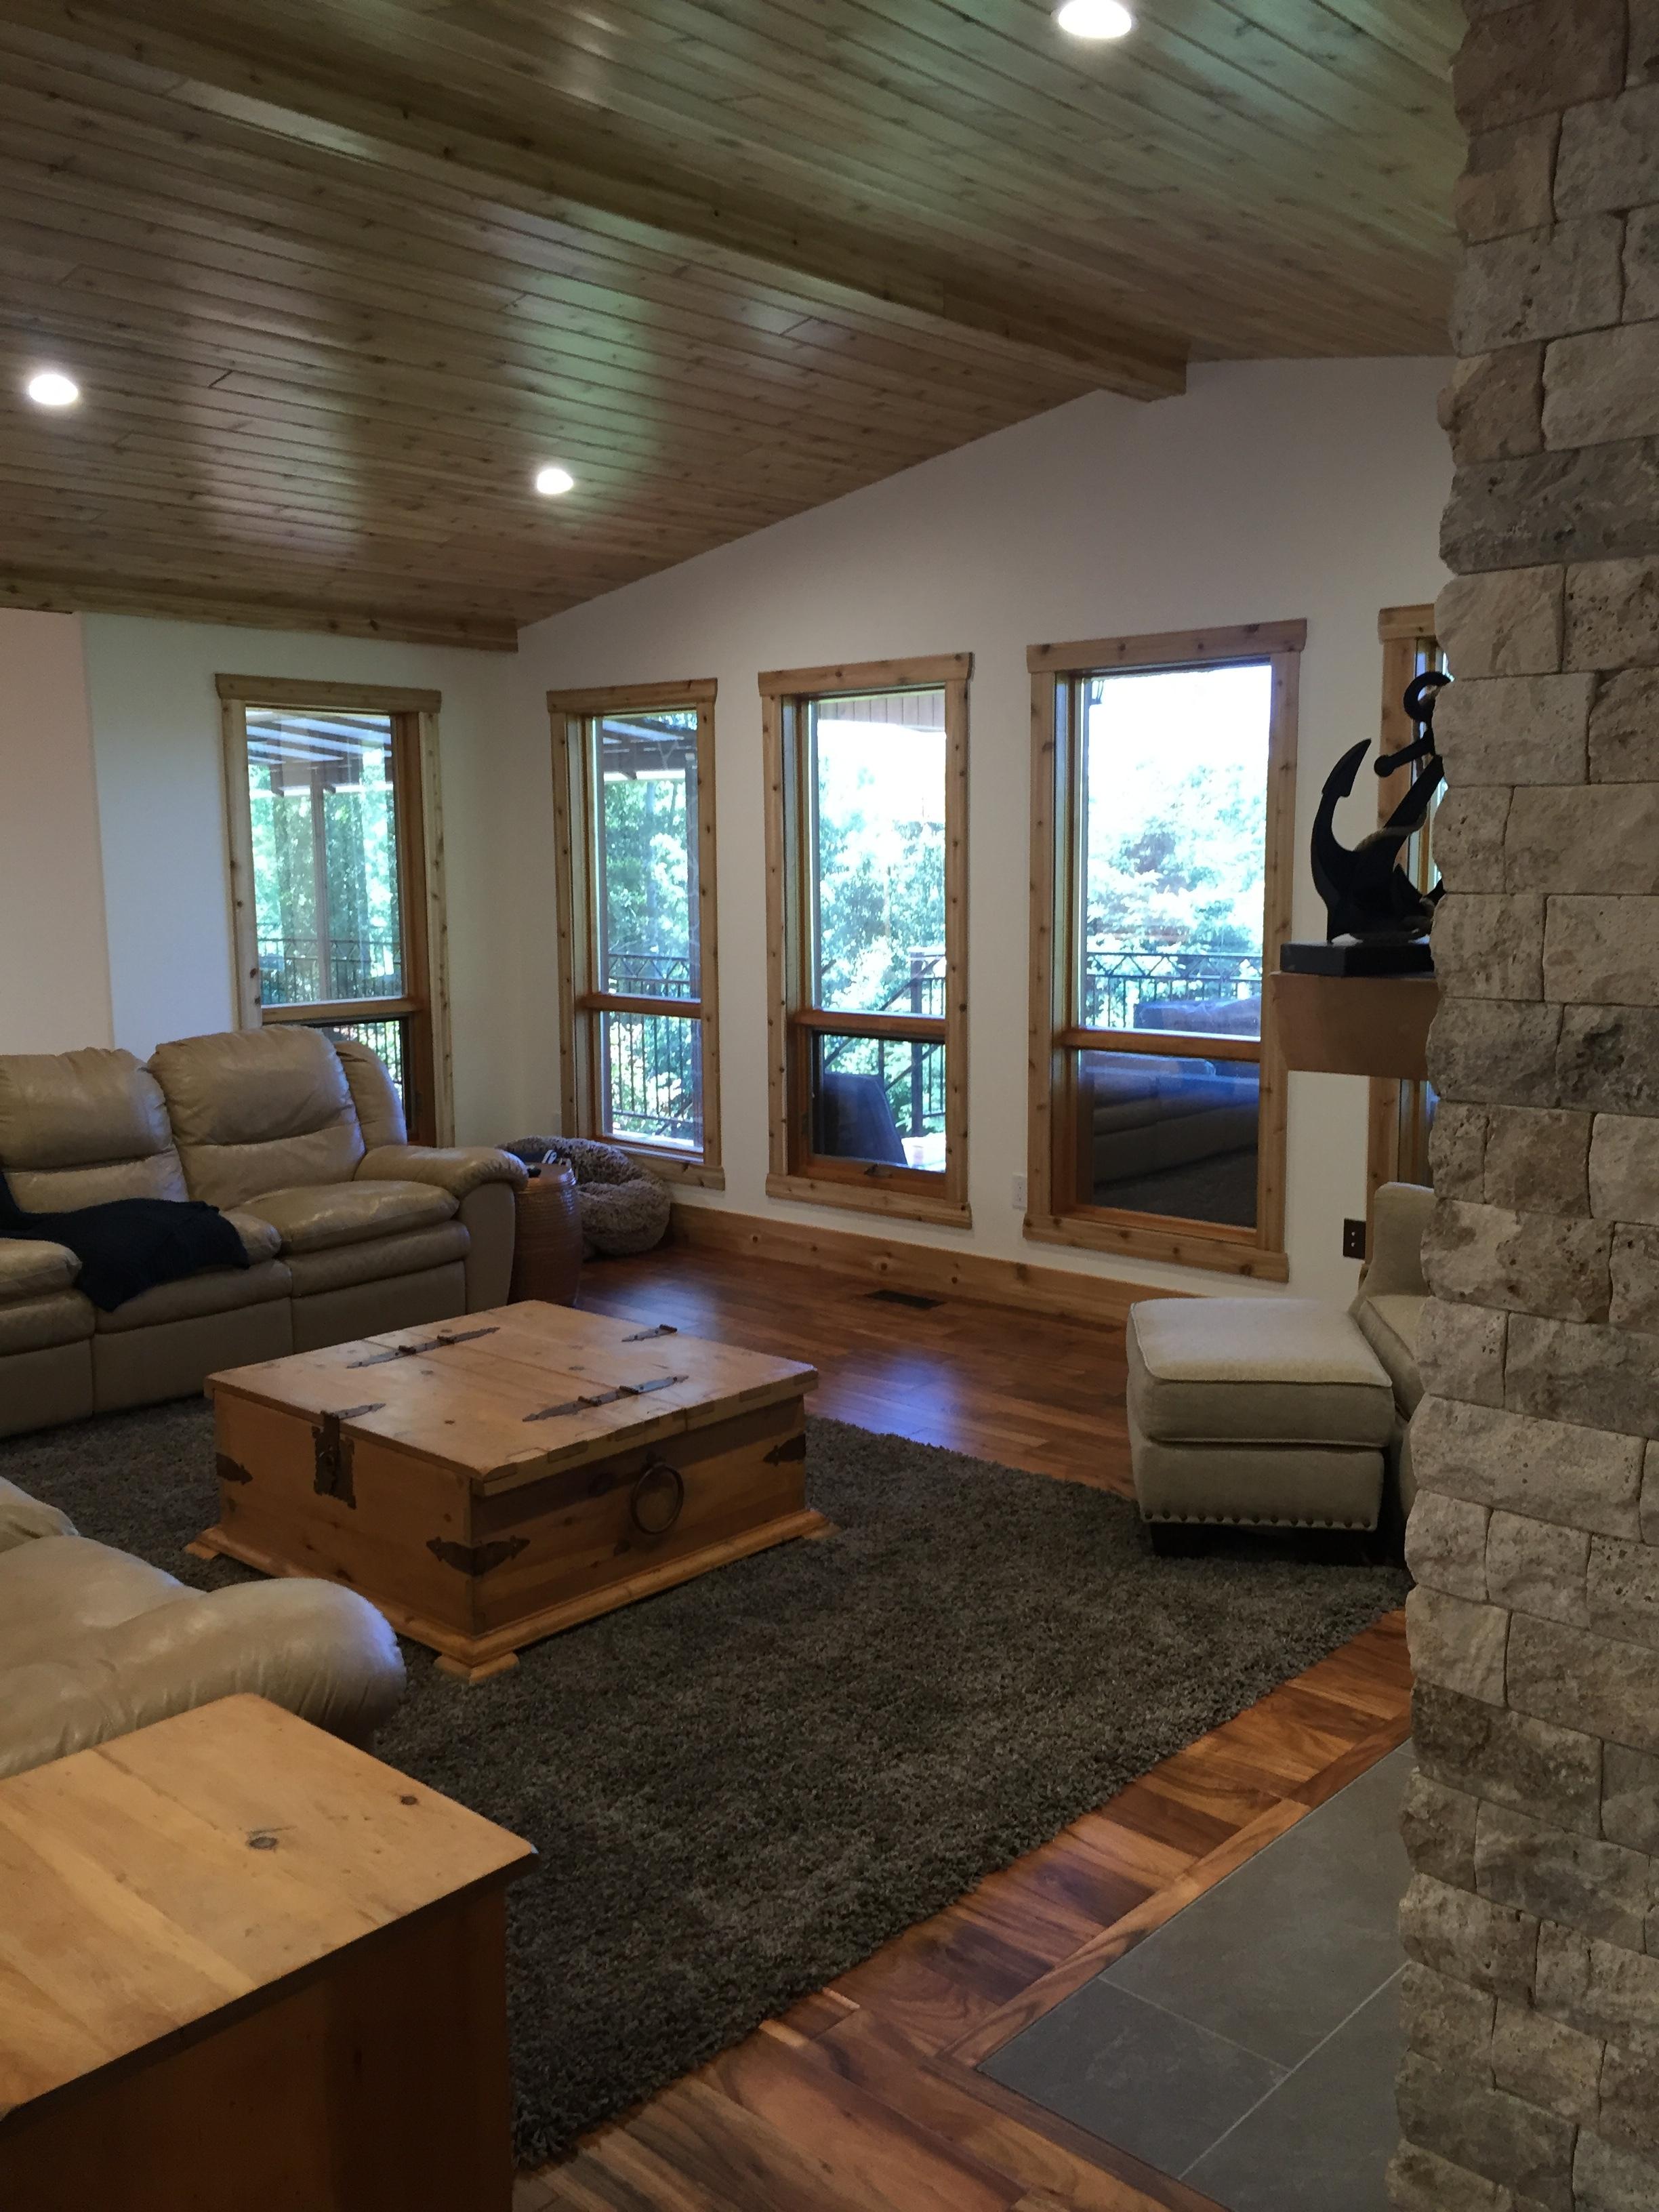 Rustic stone fireplace, cedar ceilings and window trim.